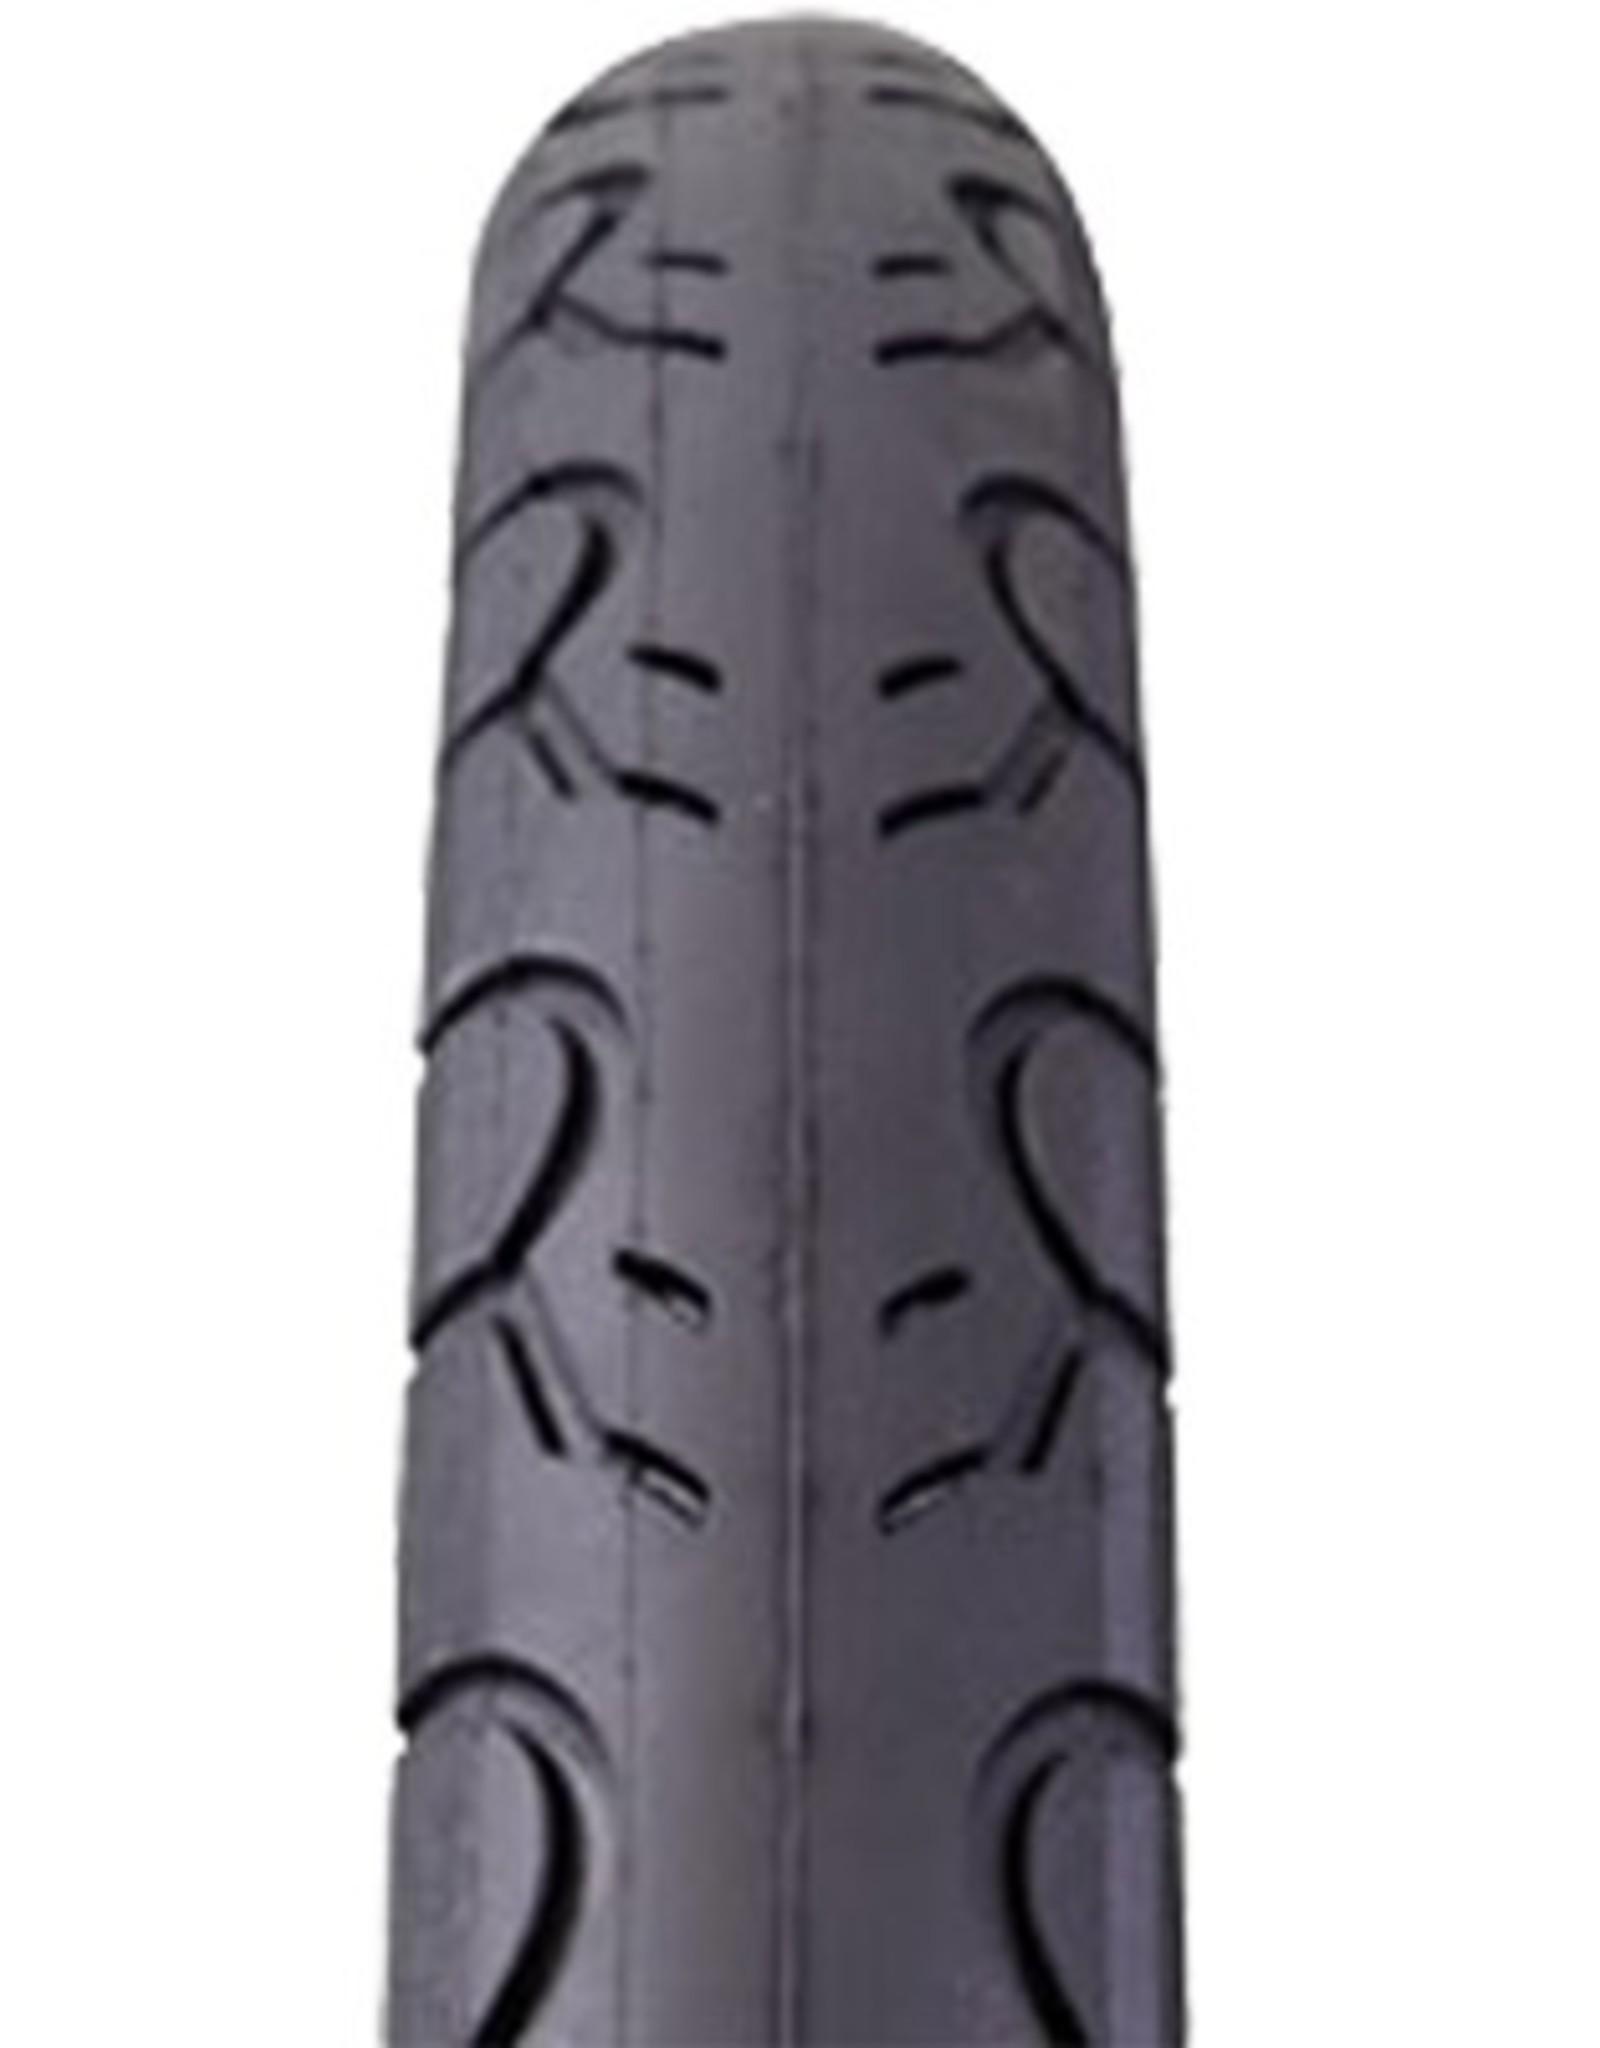 Kenda Kenda Kwest,- clincher tire 20x1.5 100 psi tire